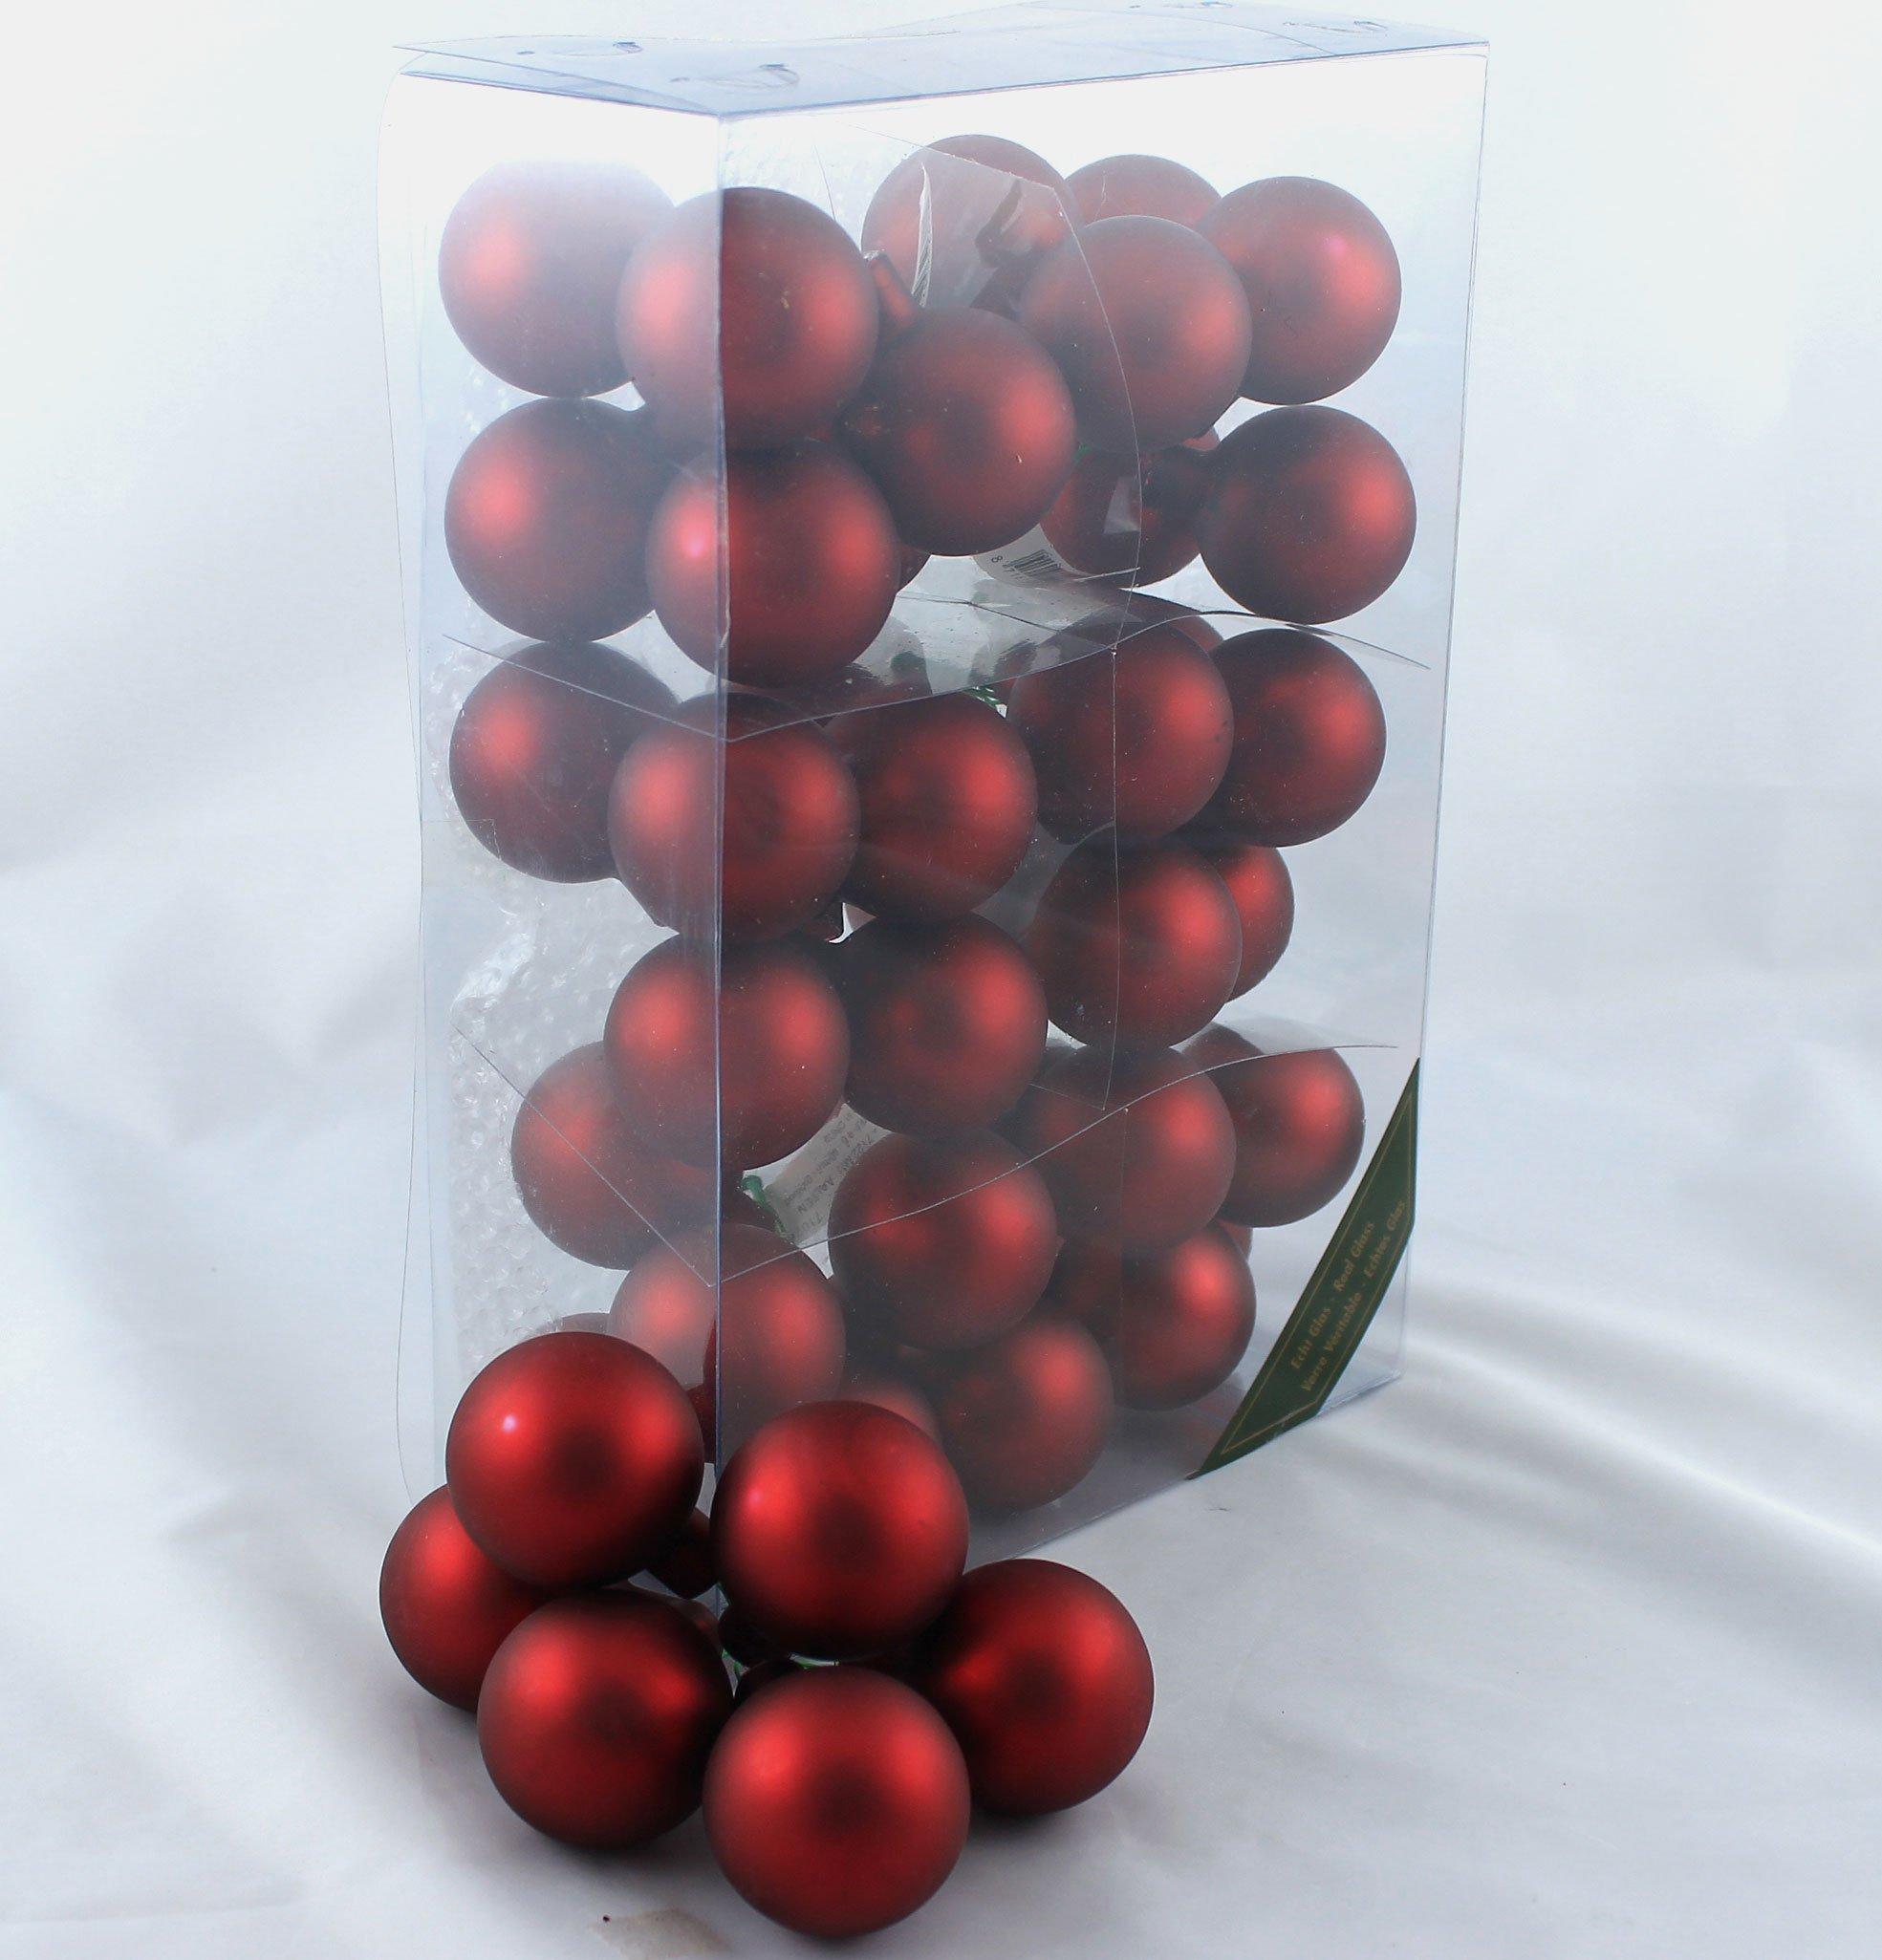 spiegelbeeren am draht ochsenblut matt 40mm 36st preiswert. Black Bedroom Furniture Sets. Home Design Ideas